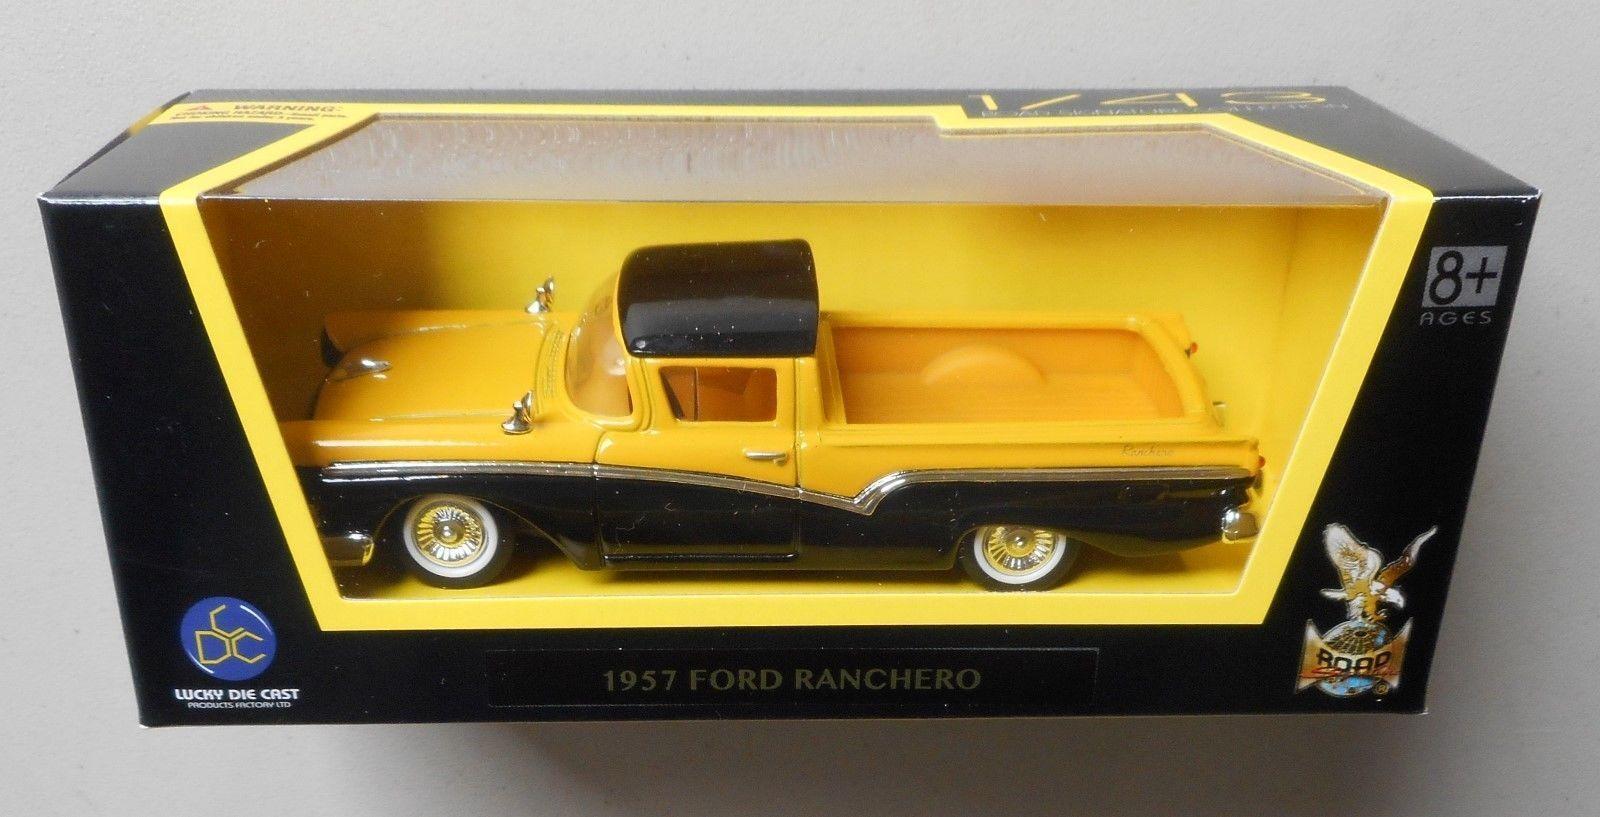 New In Box Road Signature 1/43 Diecast O Scale 1957 FORD RANCHERO